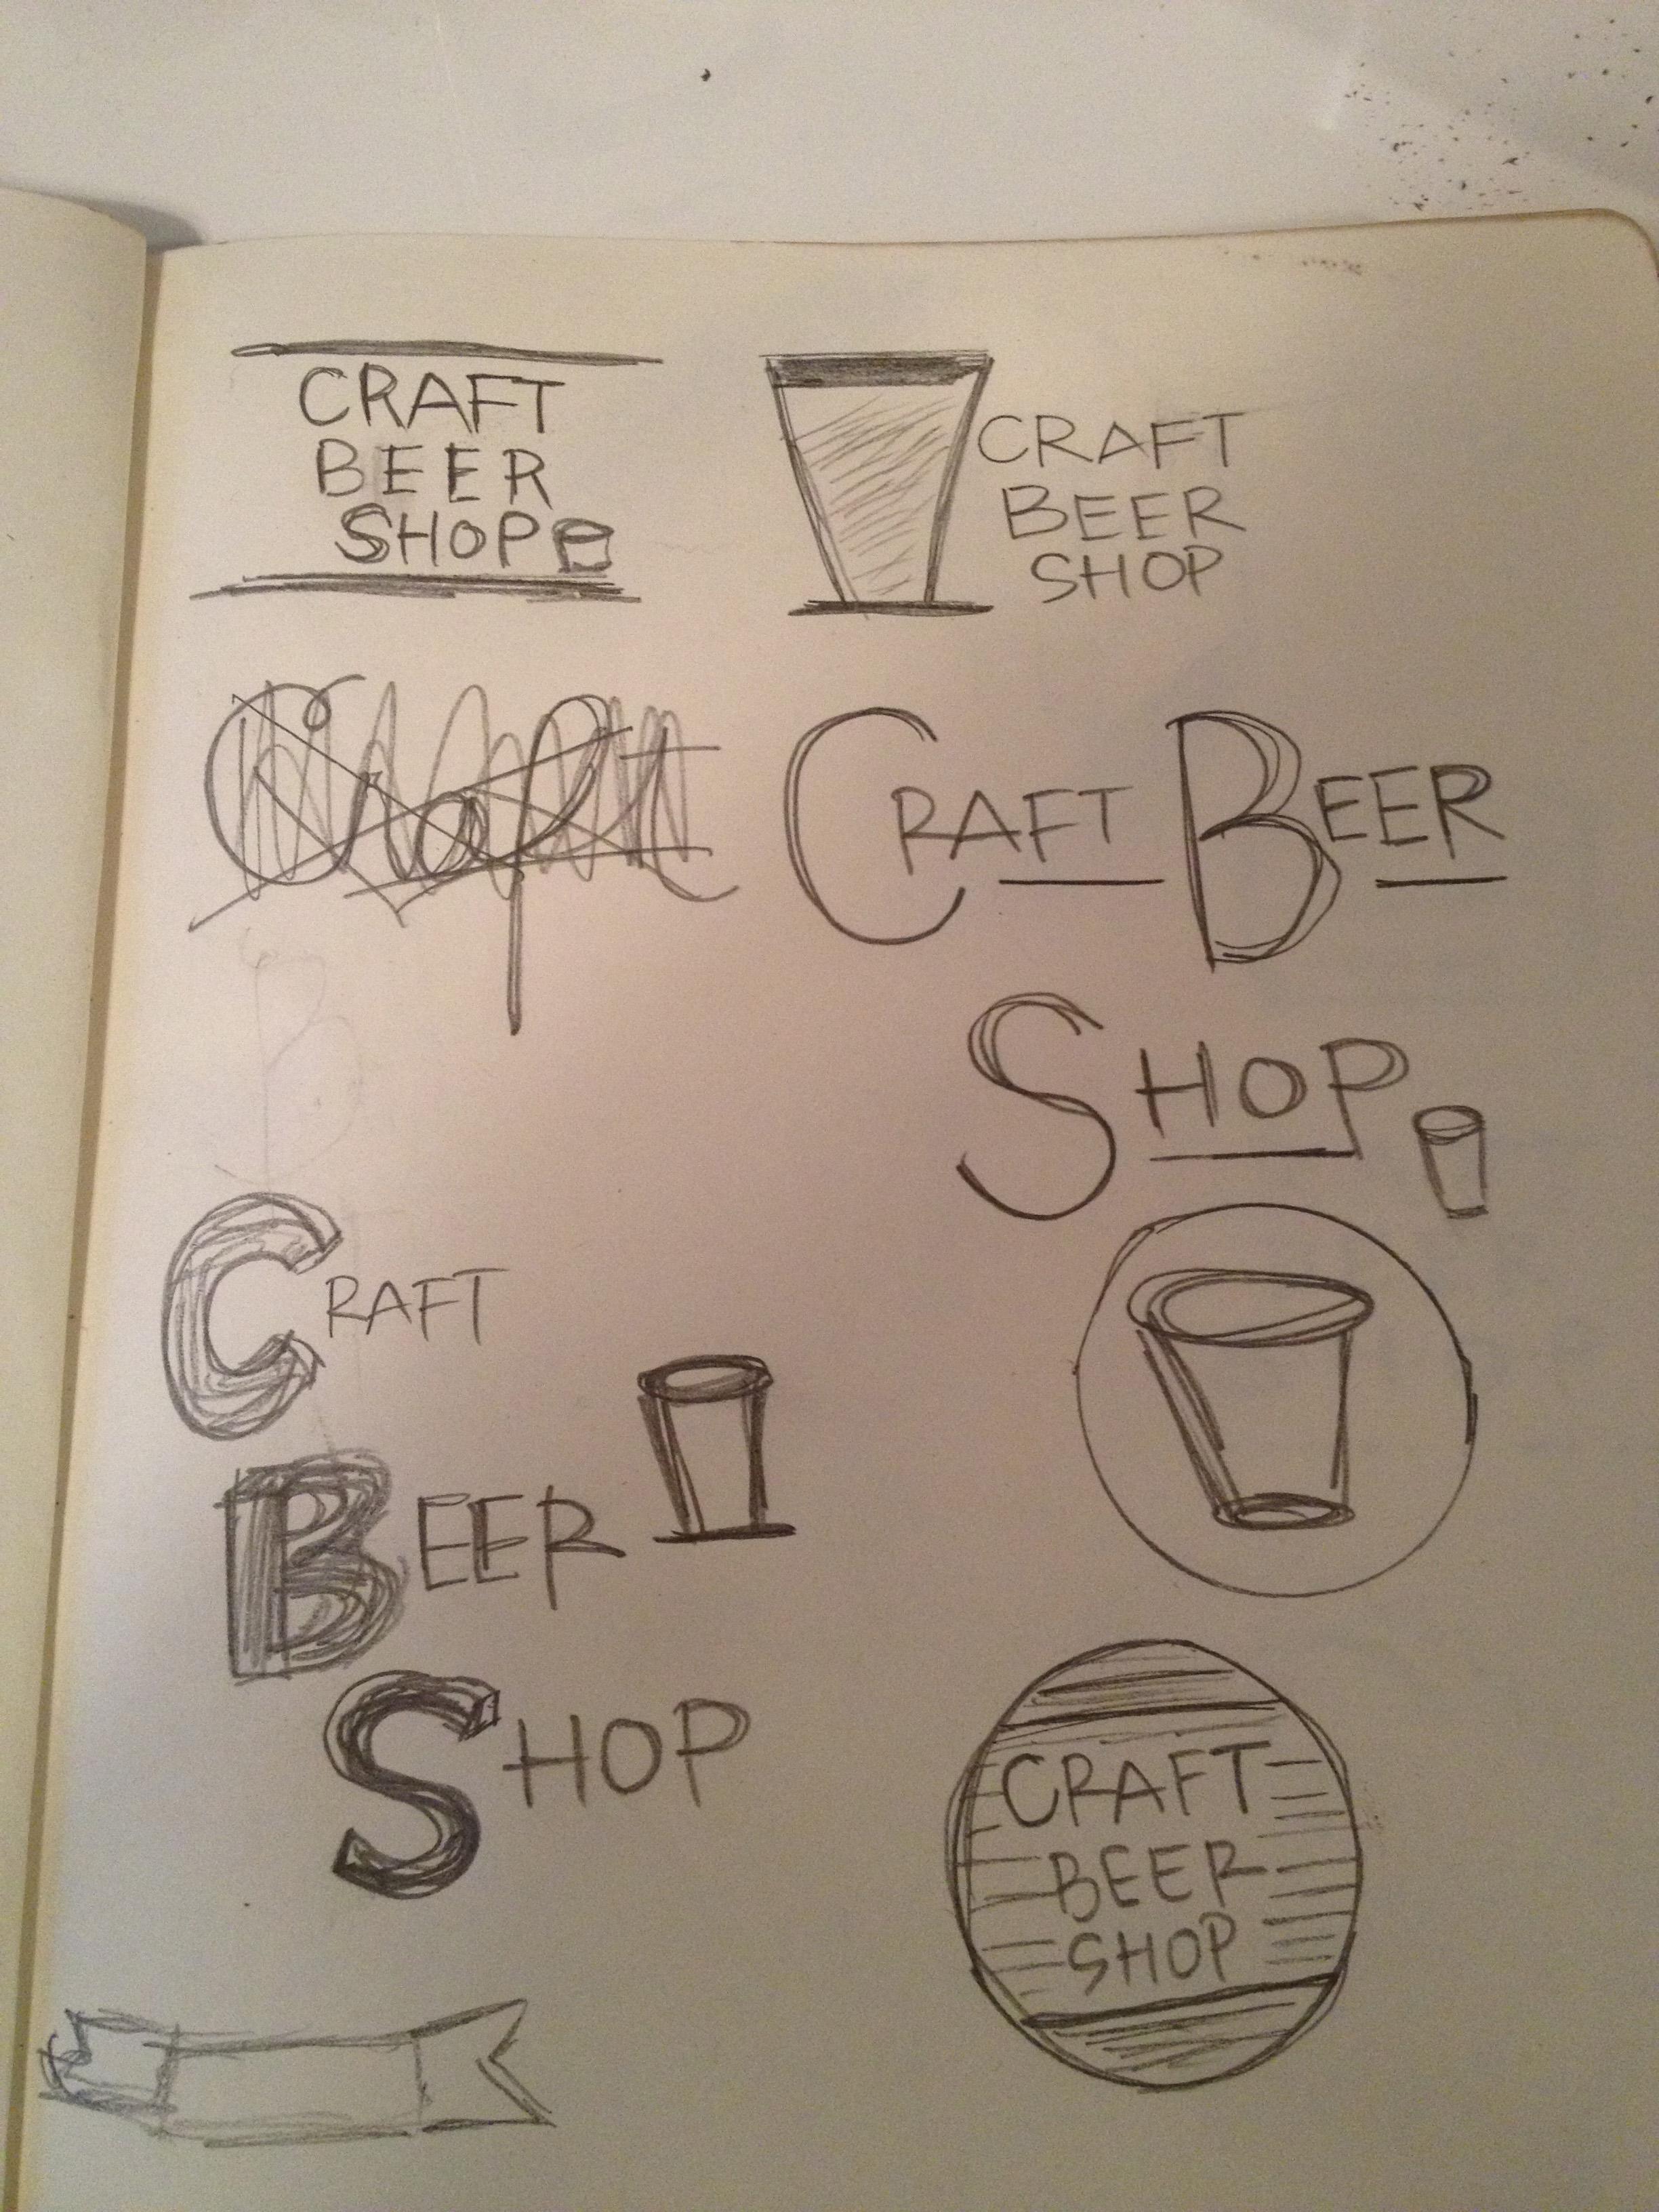 CraftBeerShop - image 1 - student project